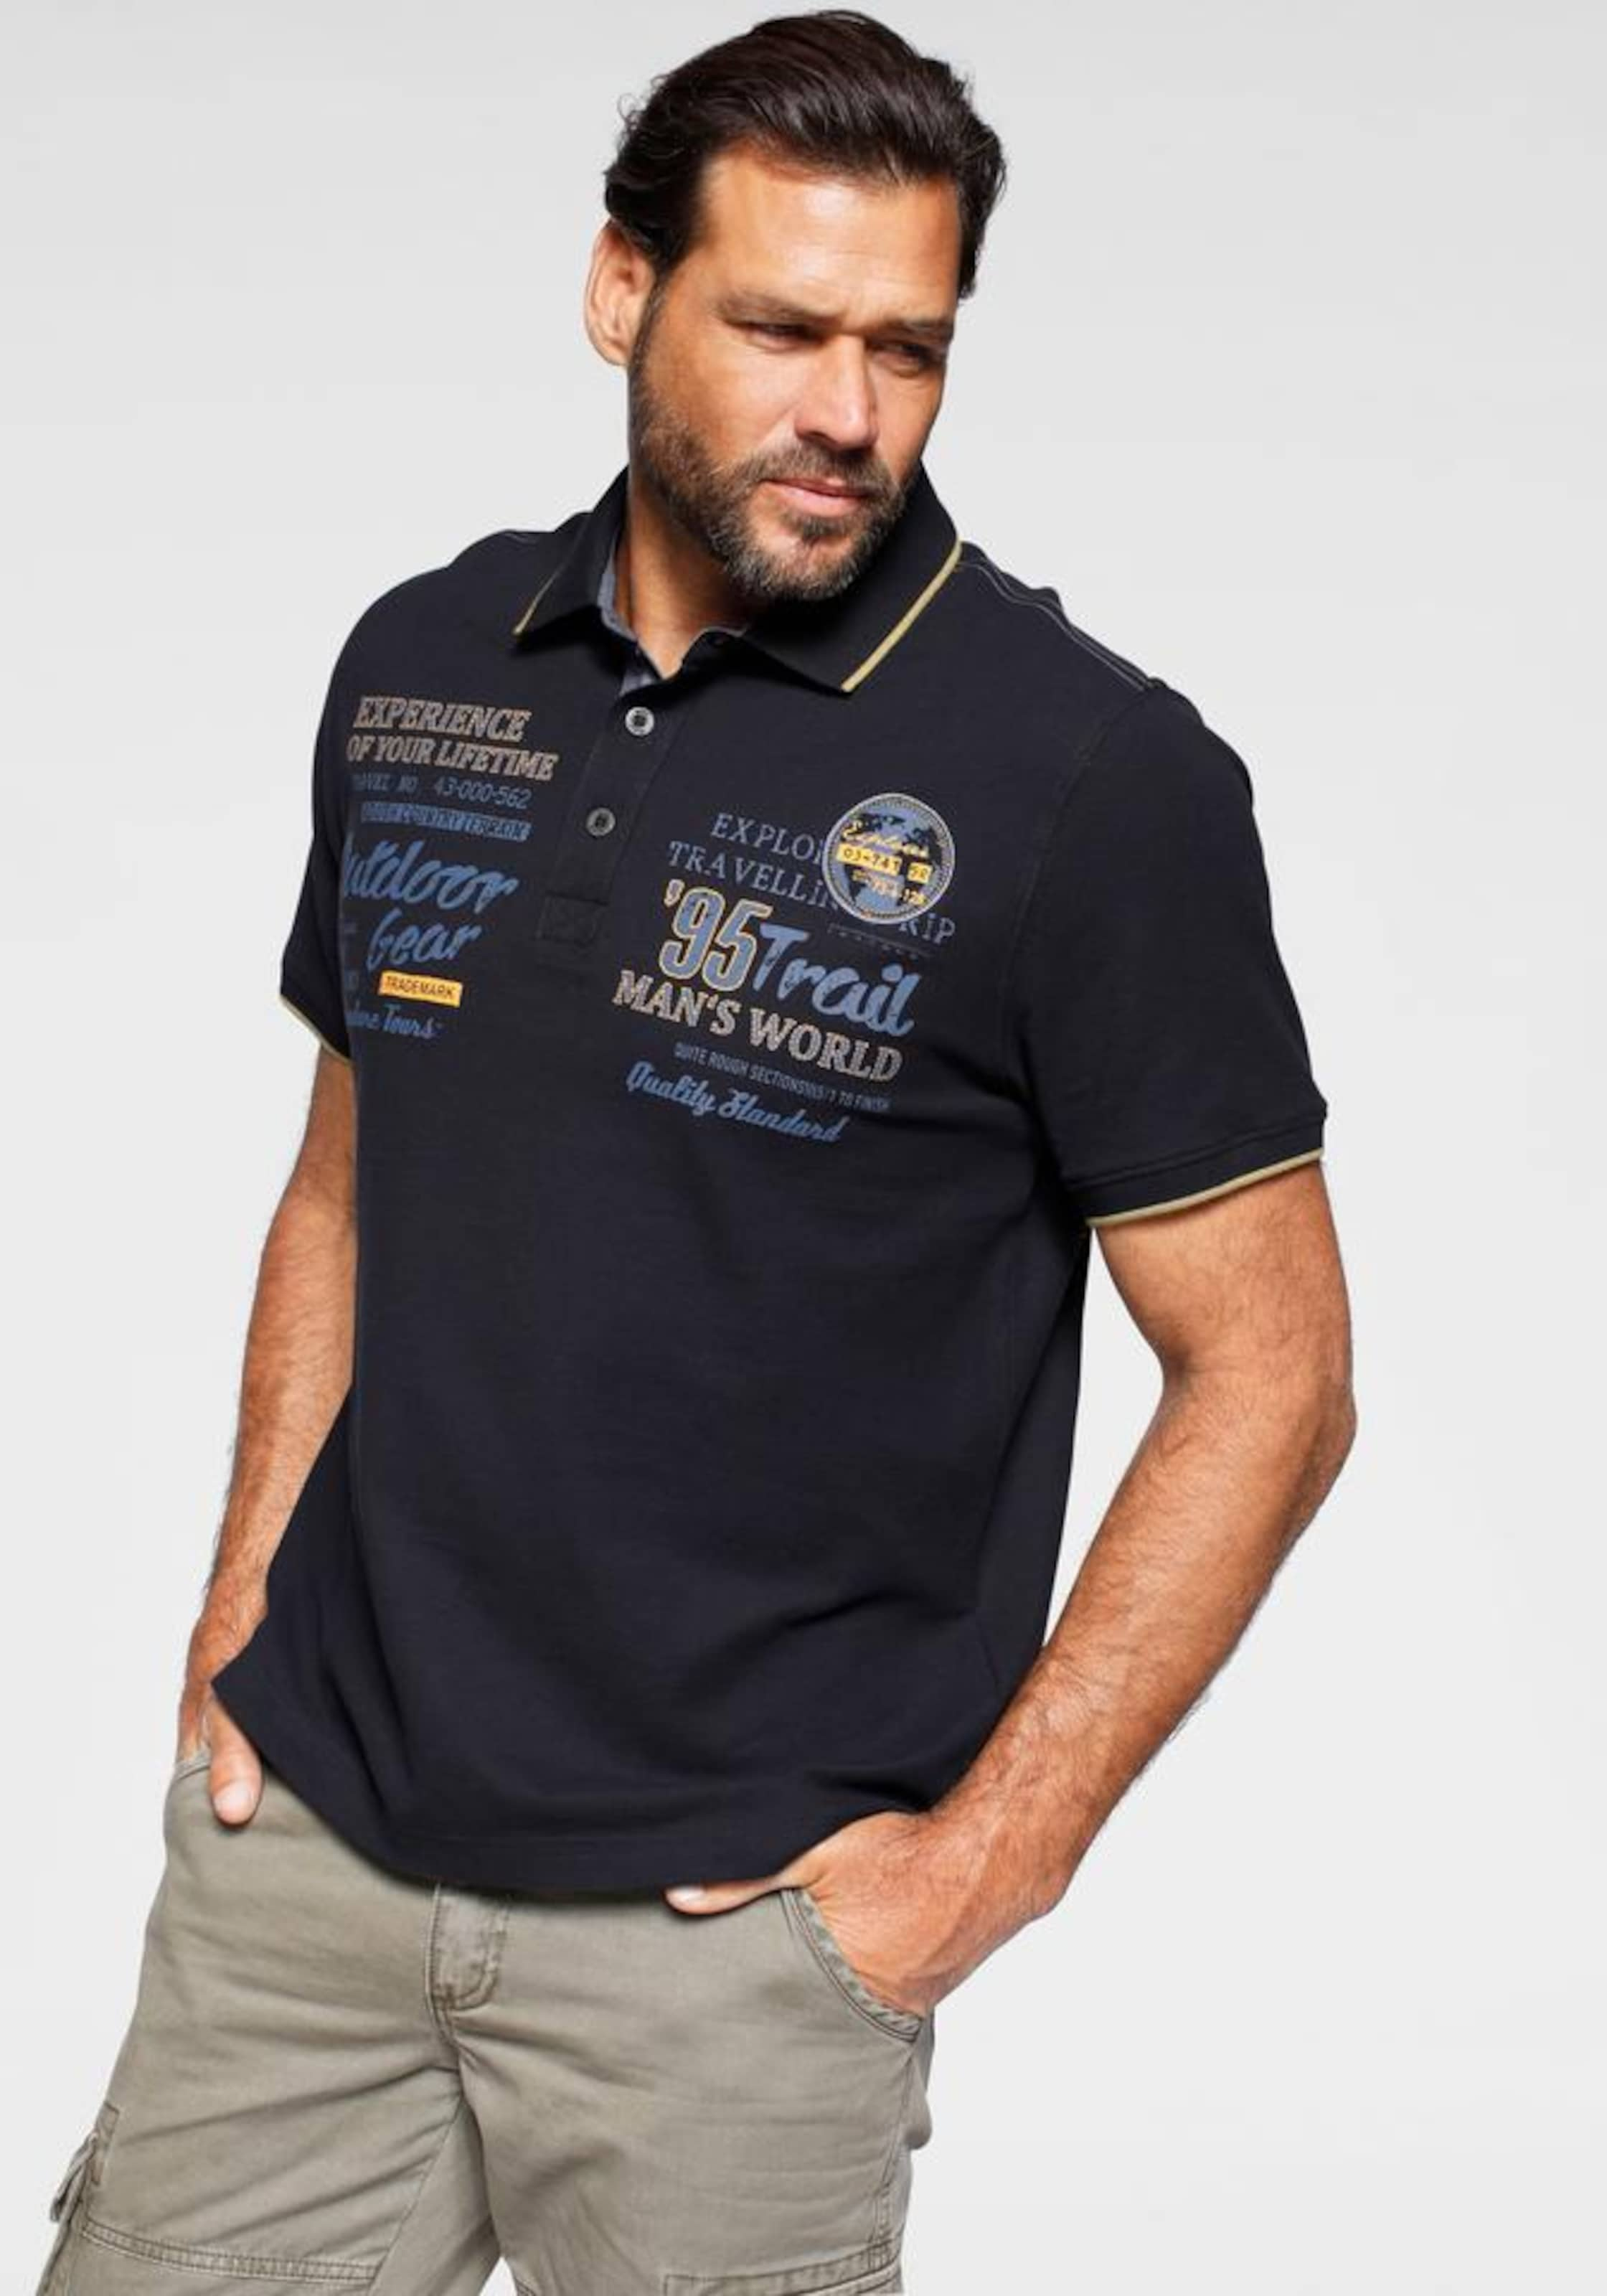 Man's World Poloshirt in dunkelblau Jersey 1000326296